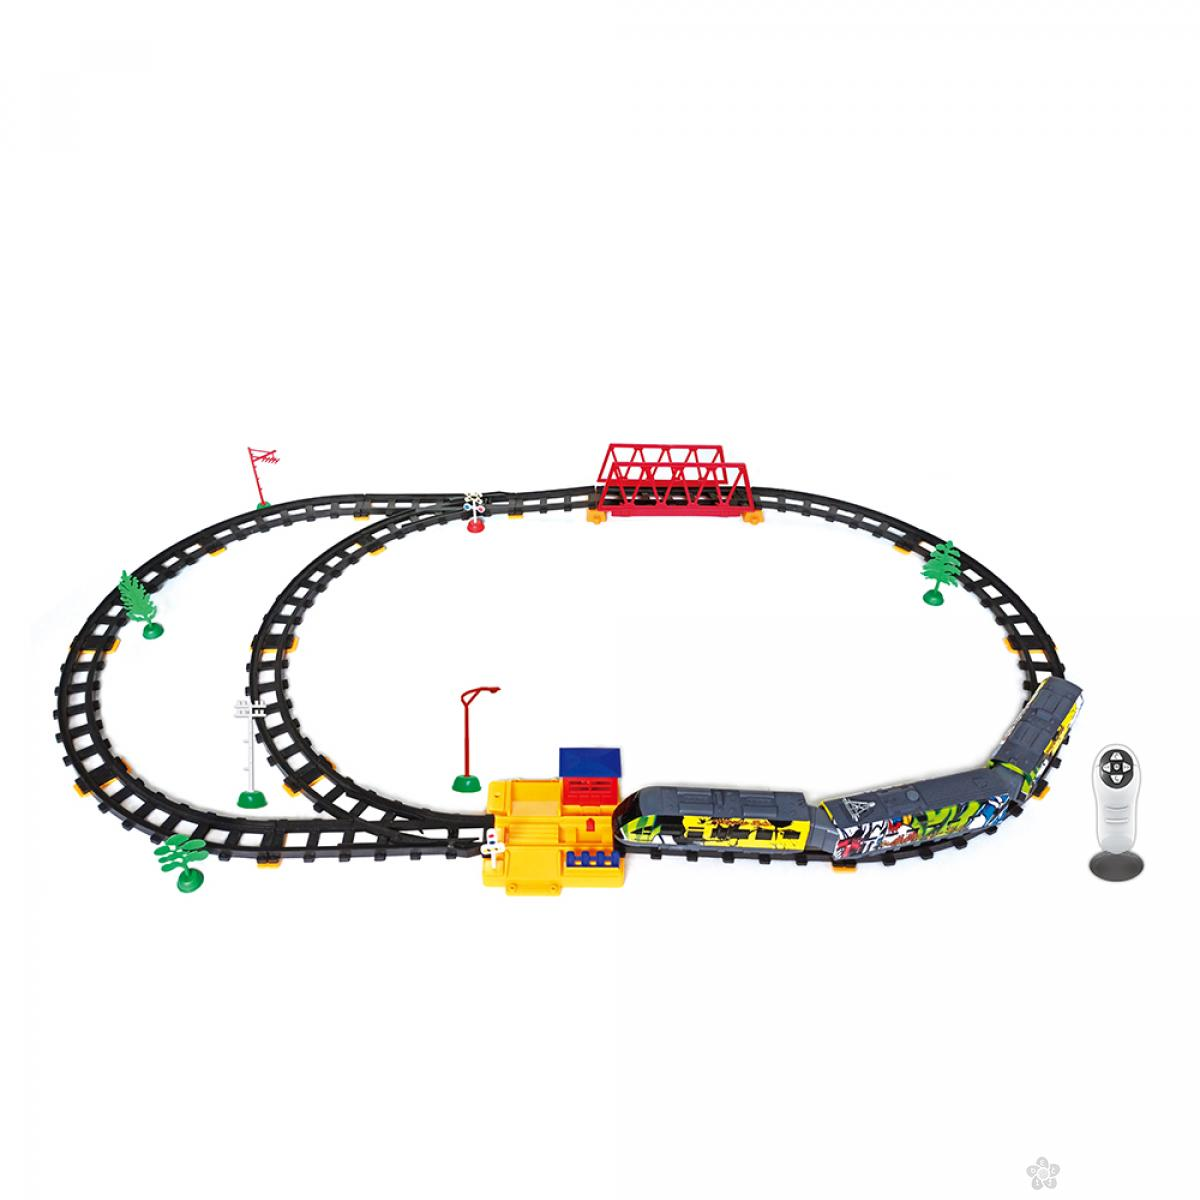 RC Voz, železnicka stanica i most- 51 Element 23052